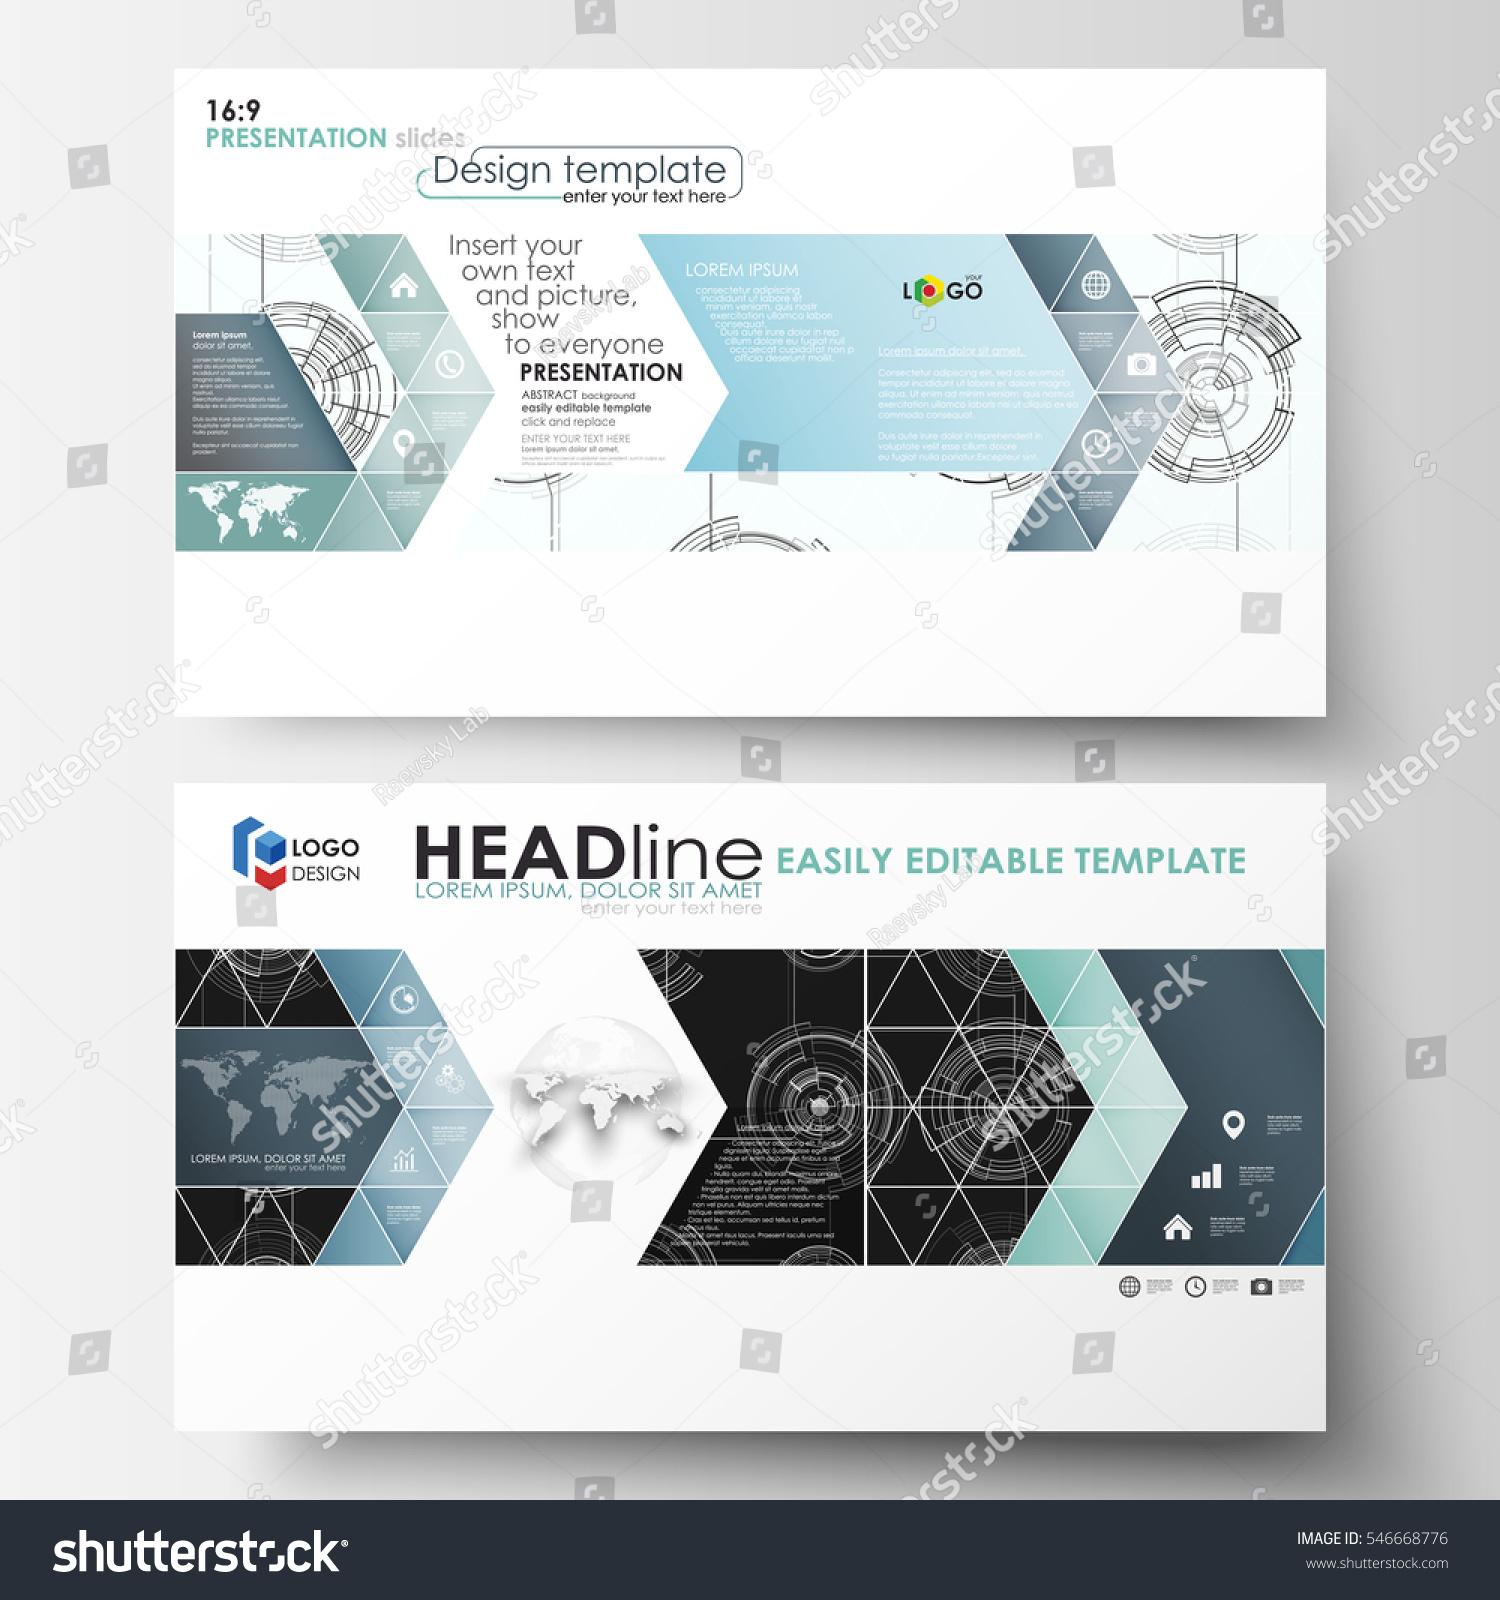 Business Templates HD Format Presentation Slides Stock Vector ...